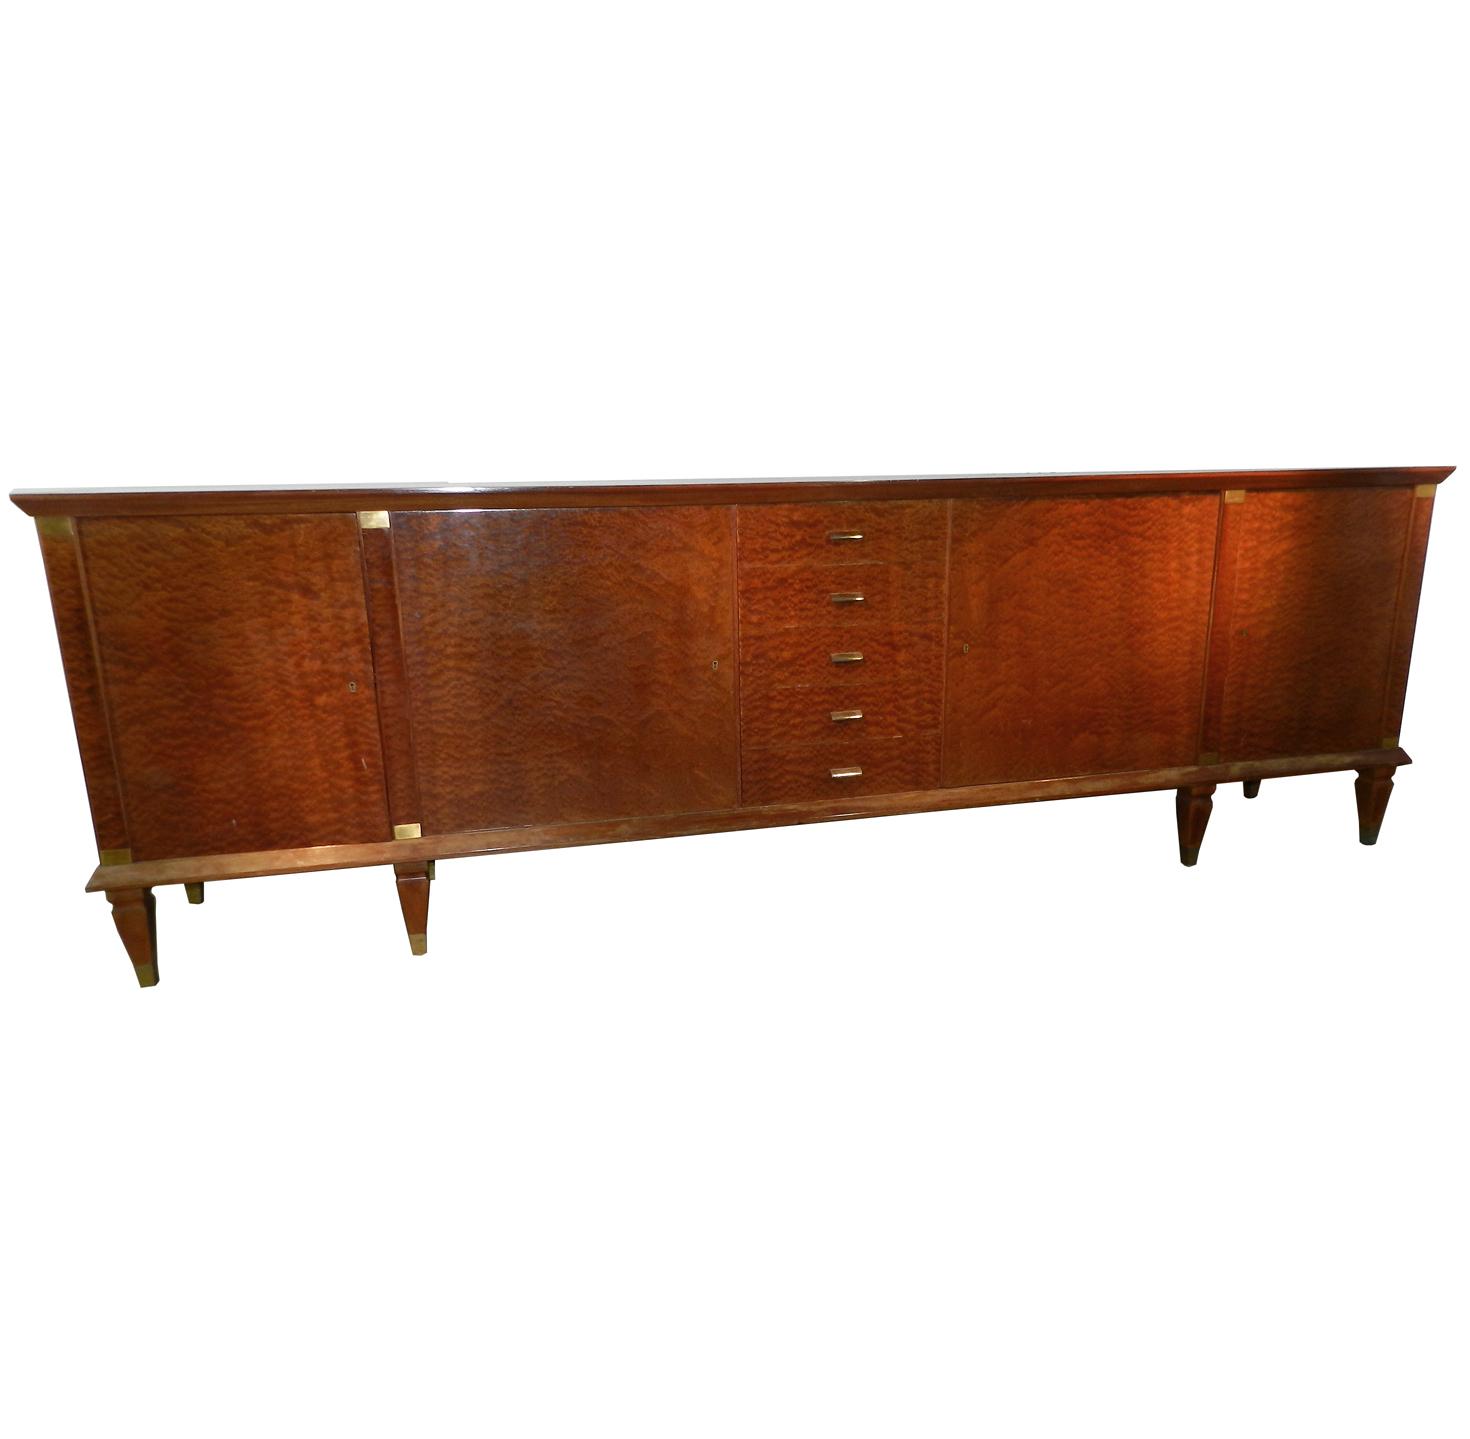 very long art deco burled veneers sideboard buffet modernism. Black Bedroom Furniture Sets. Home Design Ideas